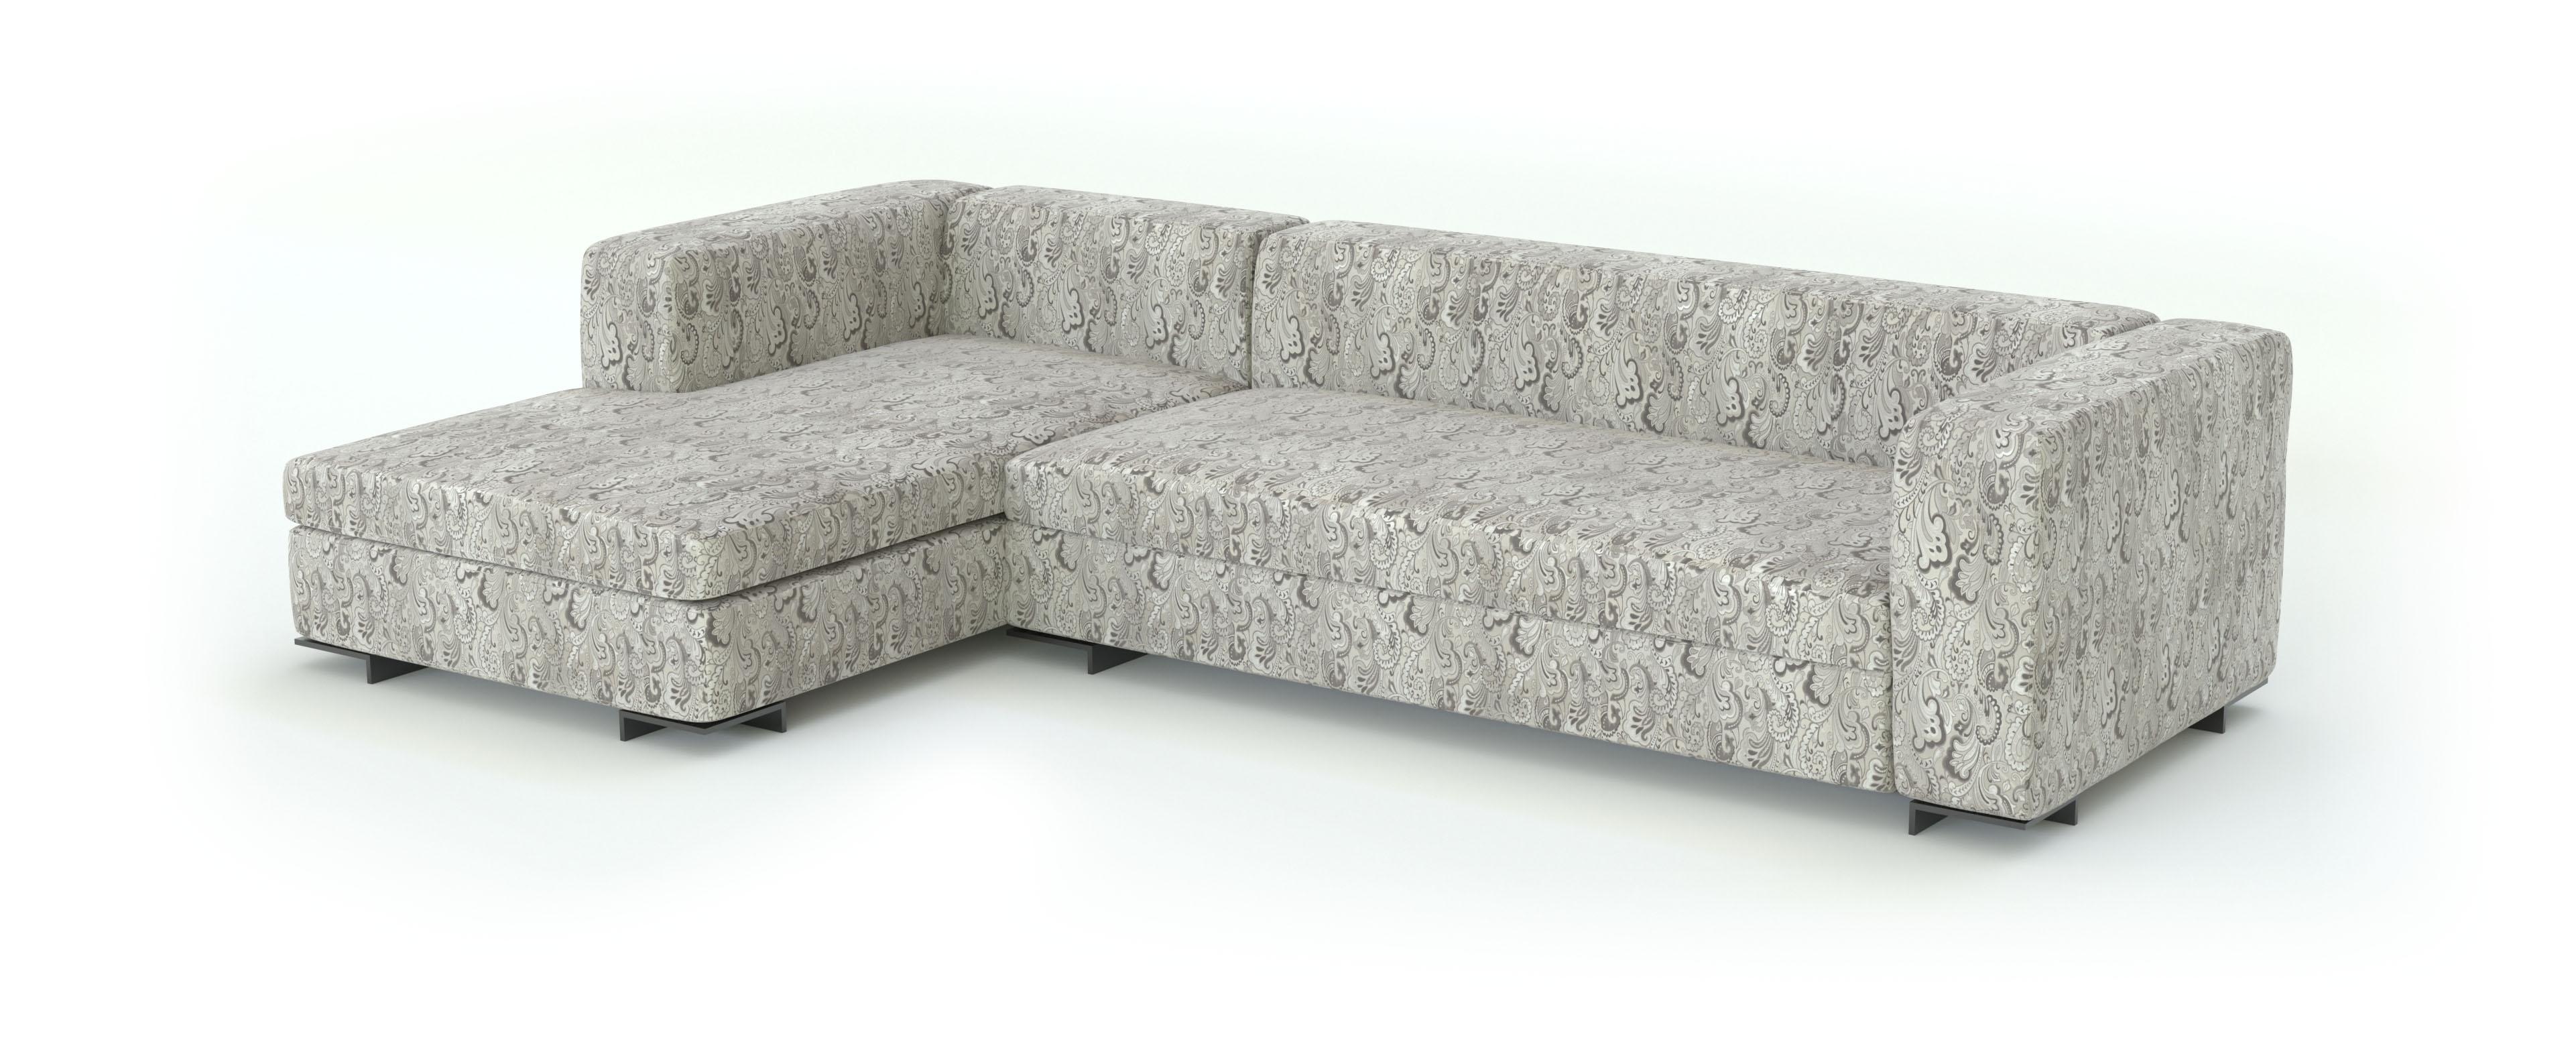 жаккард ткань для мебели 3d модель дивана